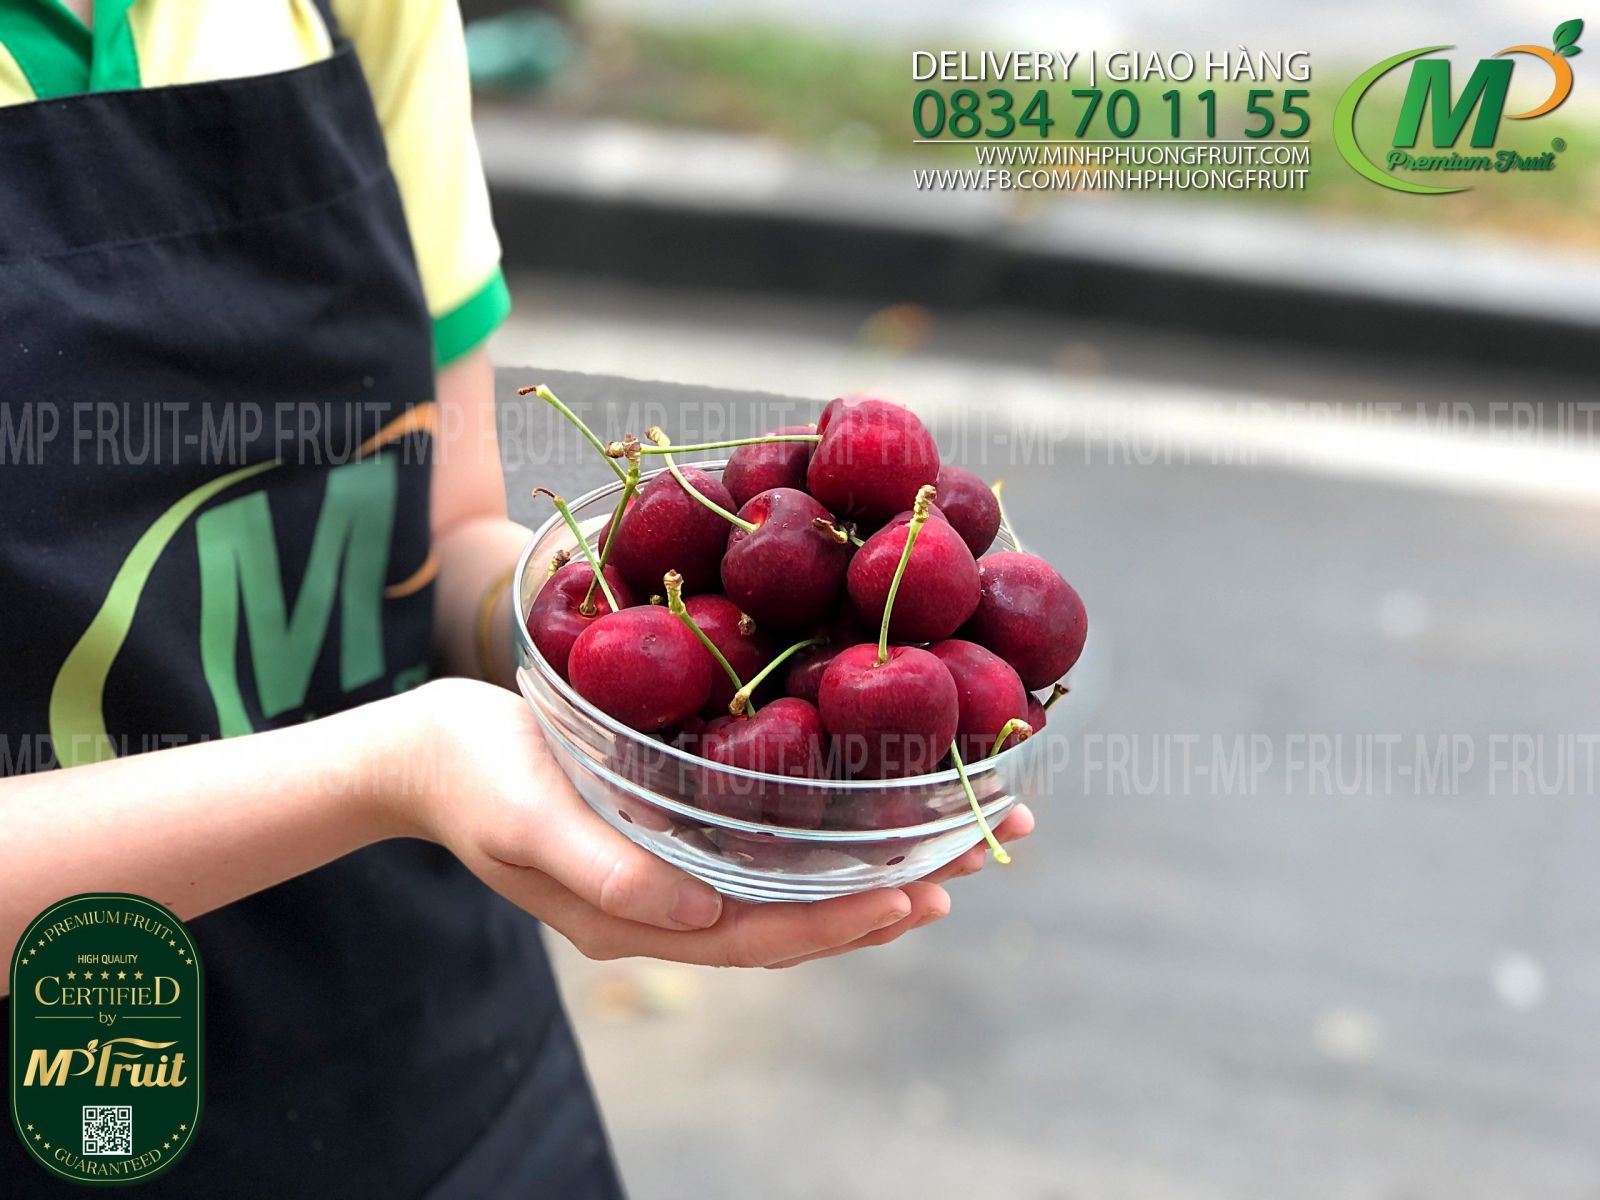 Cherry Đỏ New Zealand Size 30+ | Pongs Creek - Hộp 2kg tại MP Fruits